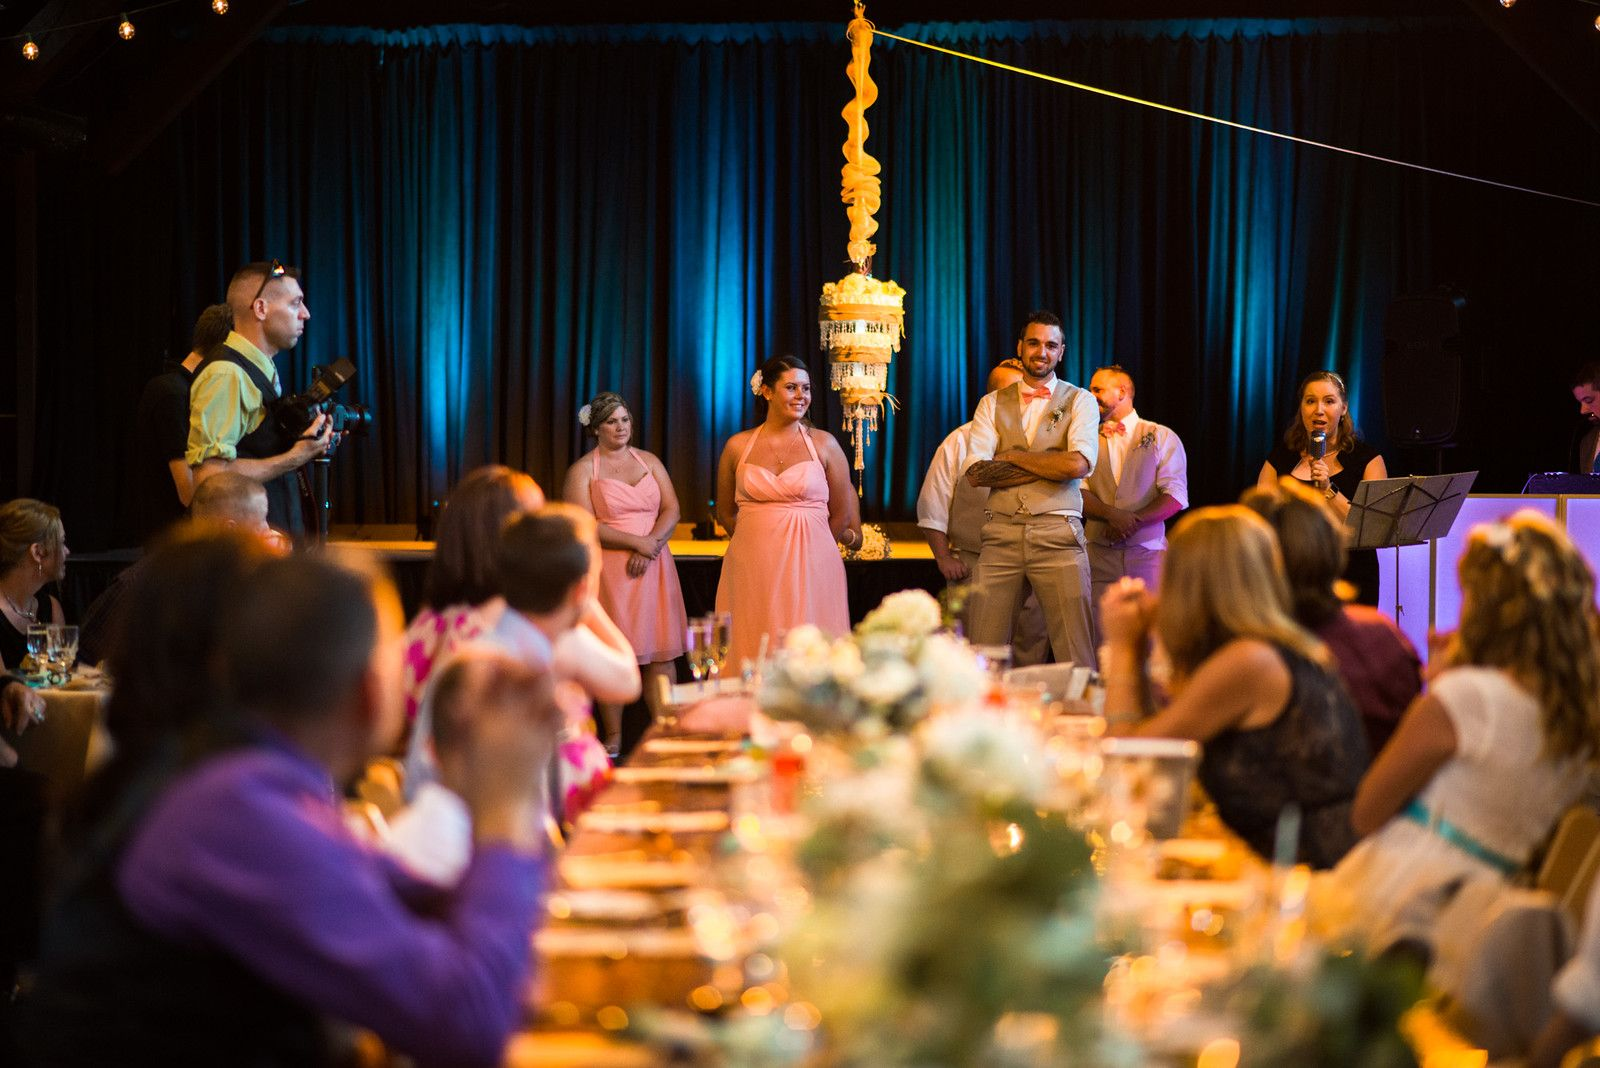 Design your own wedding dress for fun  Lighting Design Innovations  Peers u Profiles  Pinterest